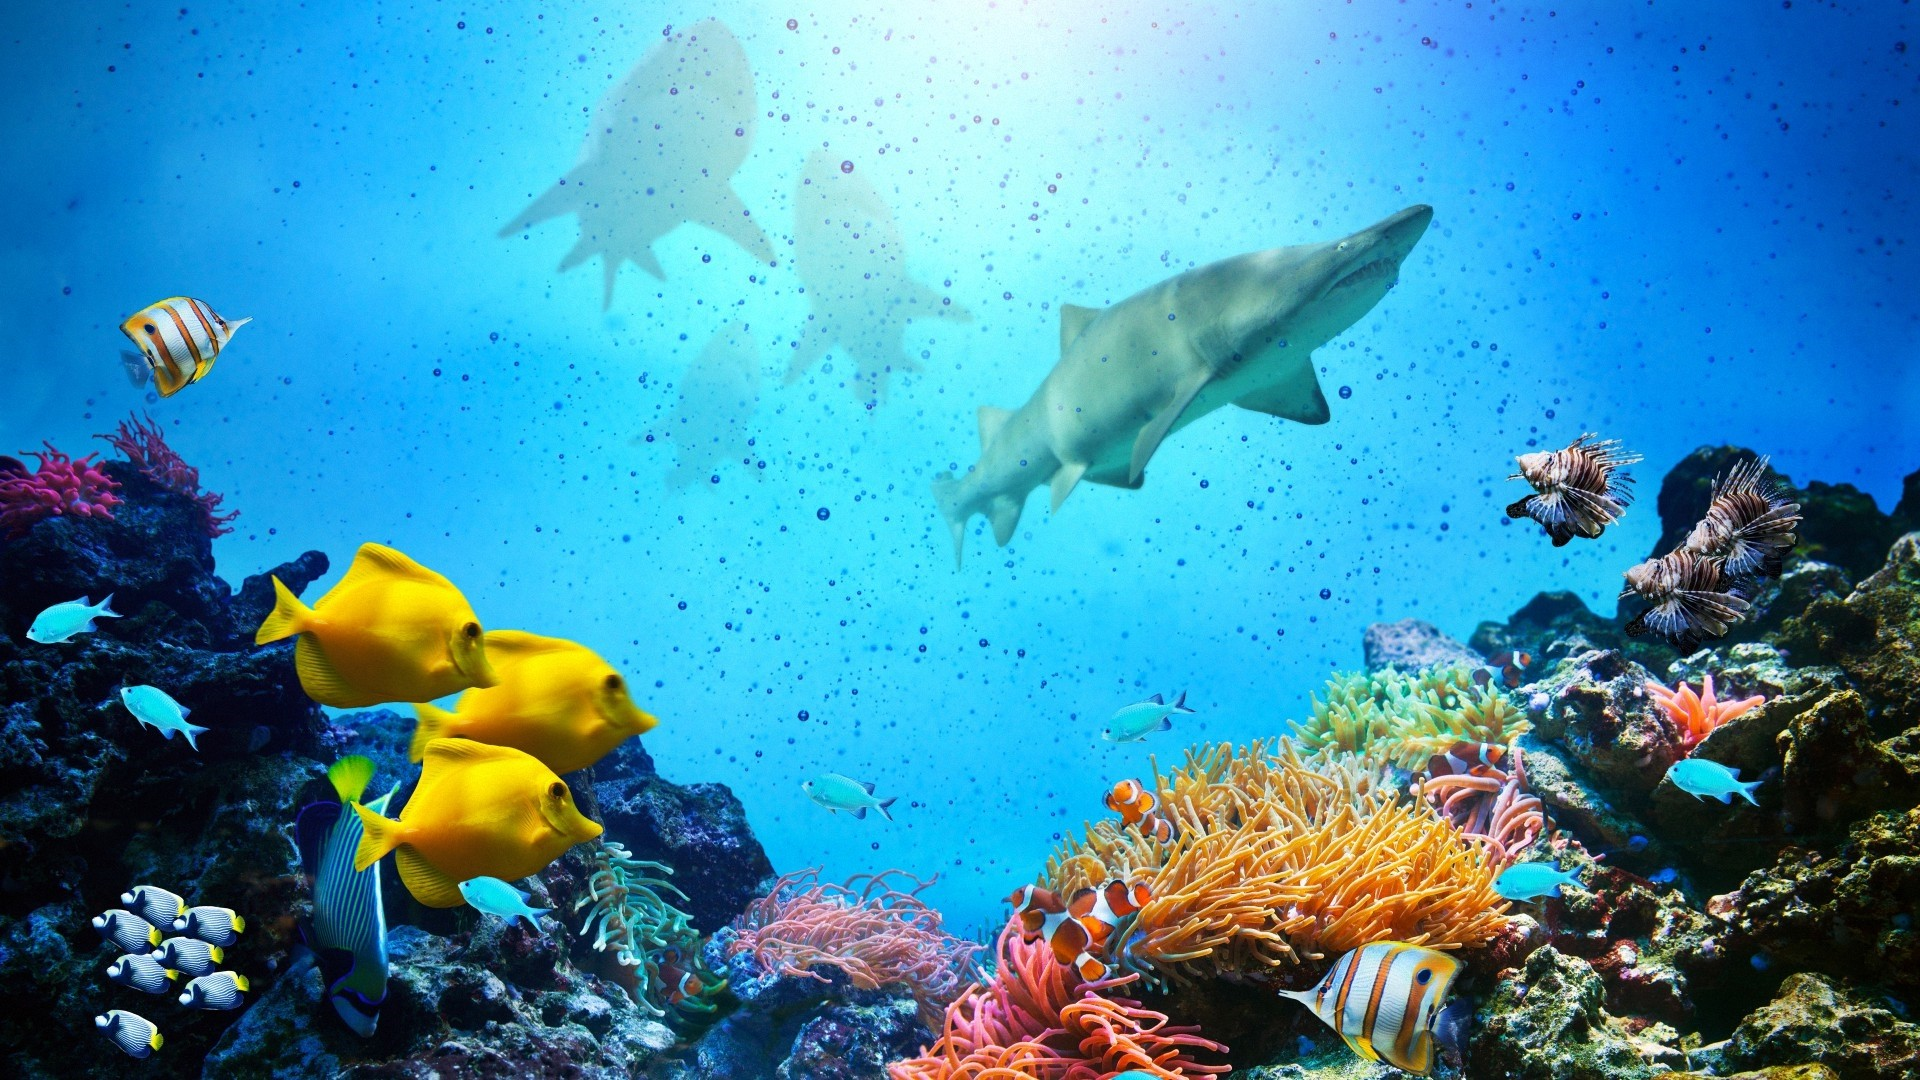 Coral Reef Download Wallpaper